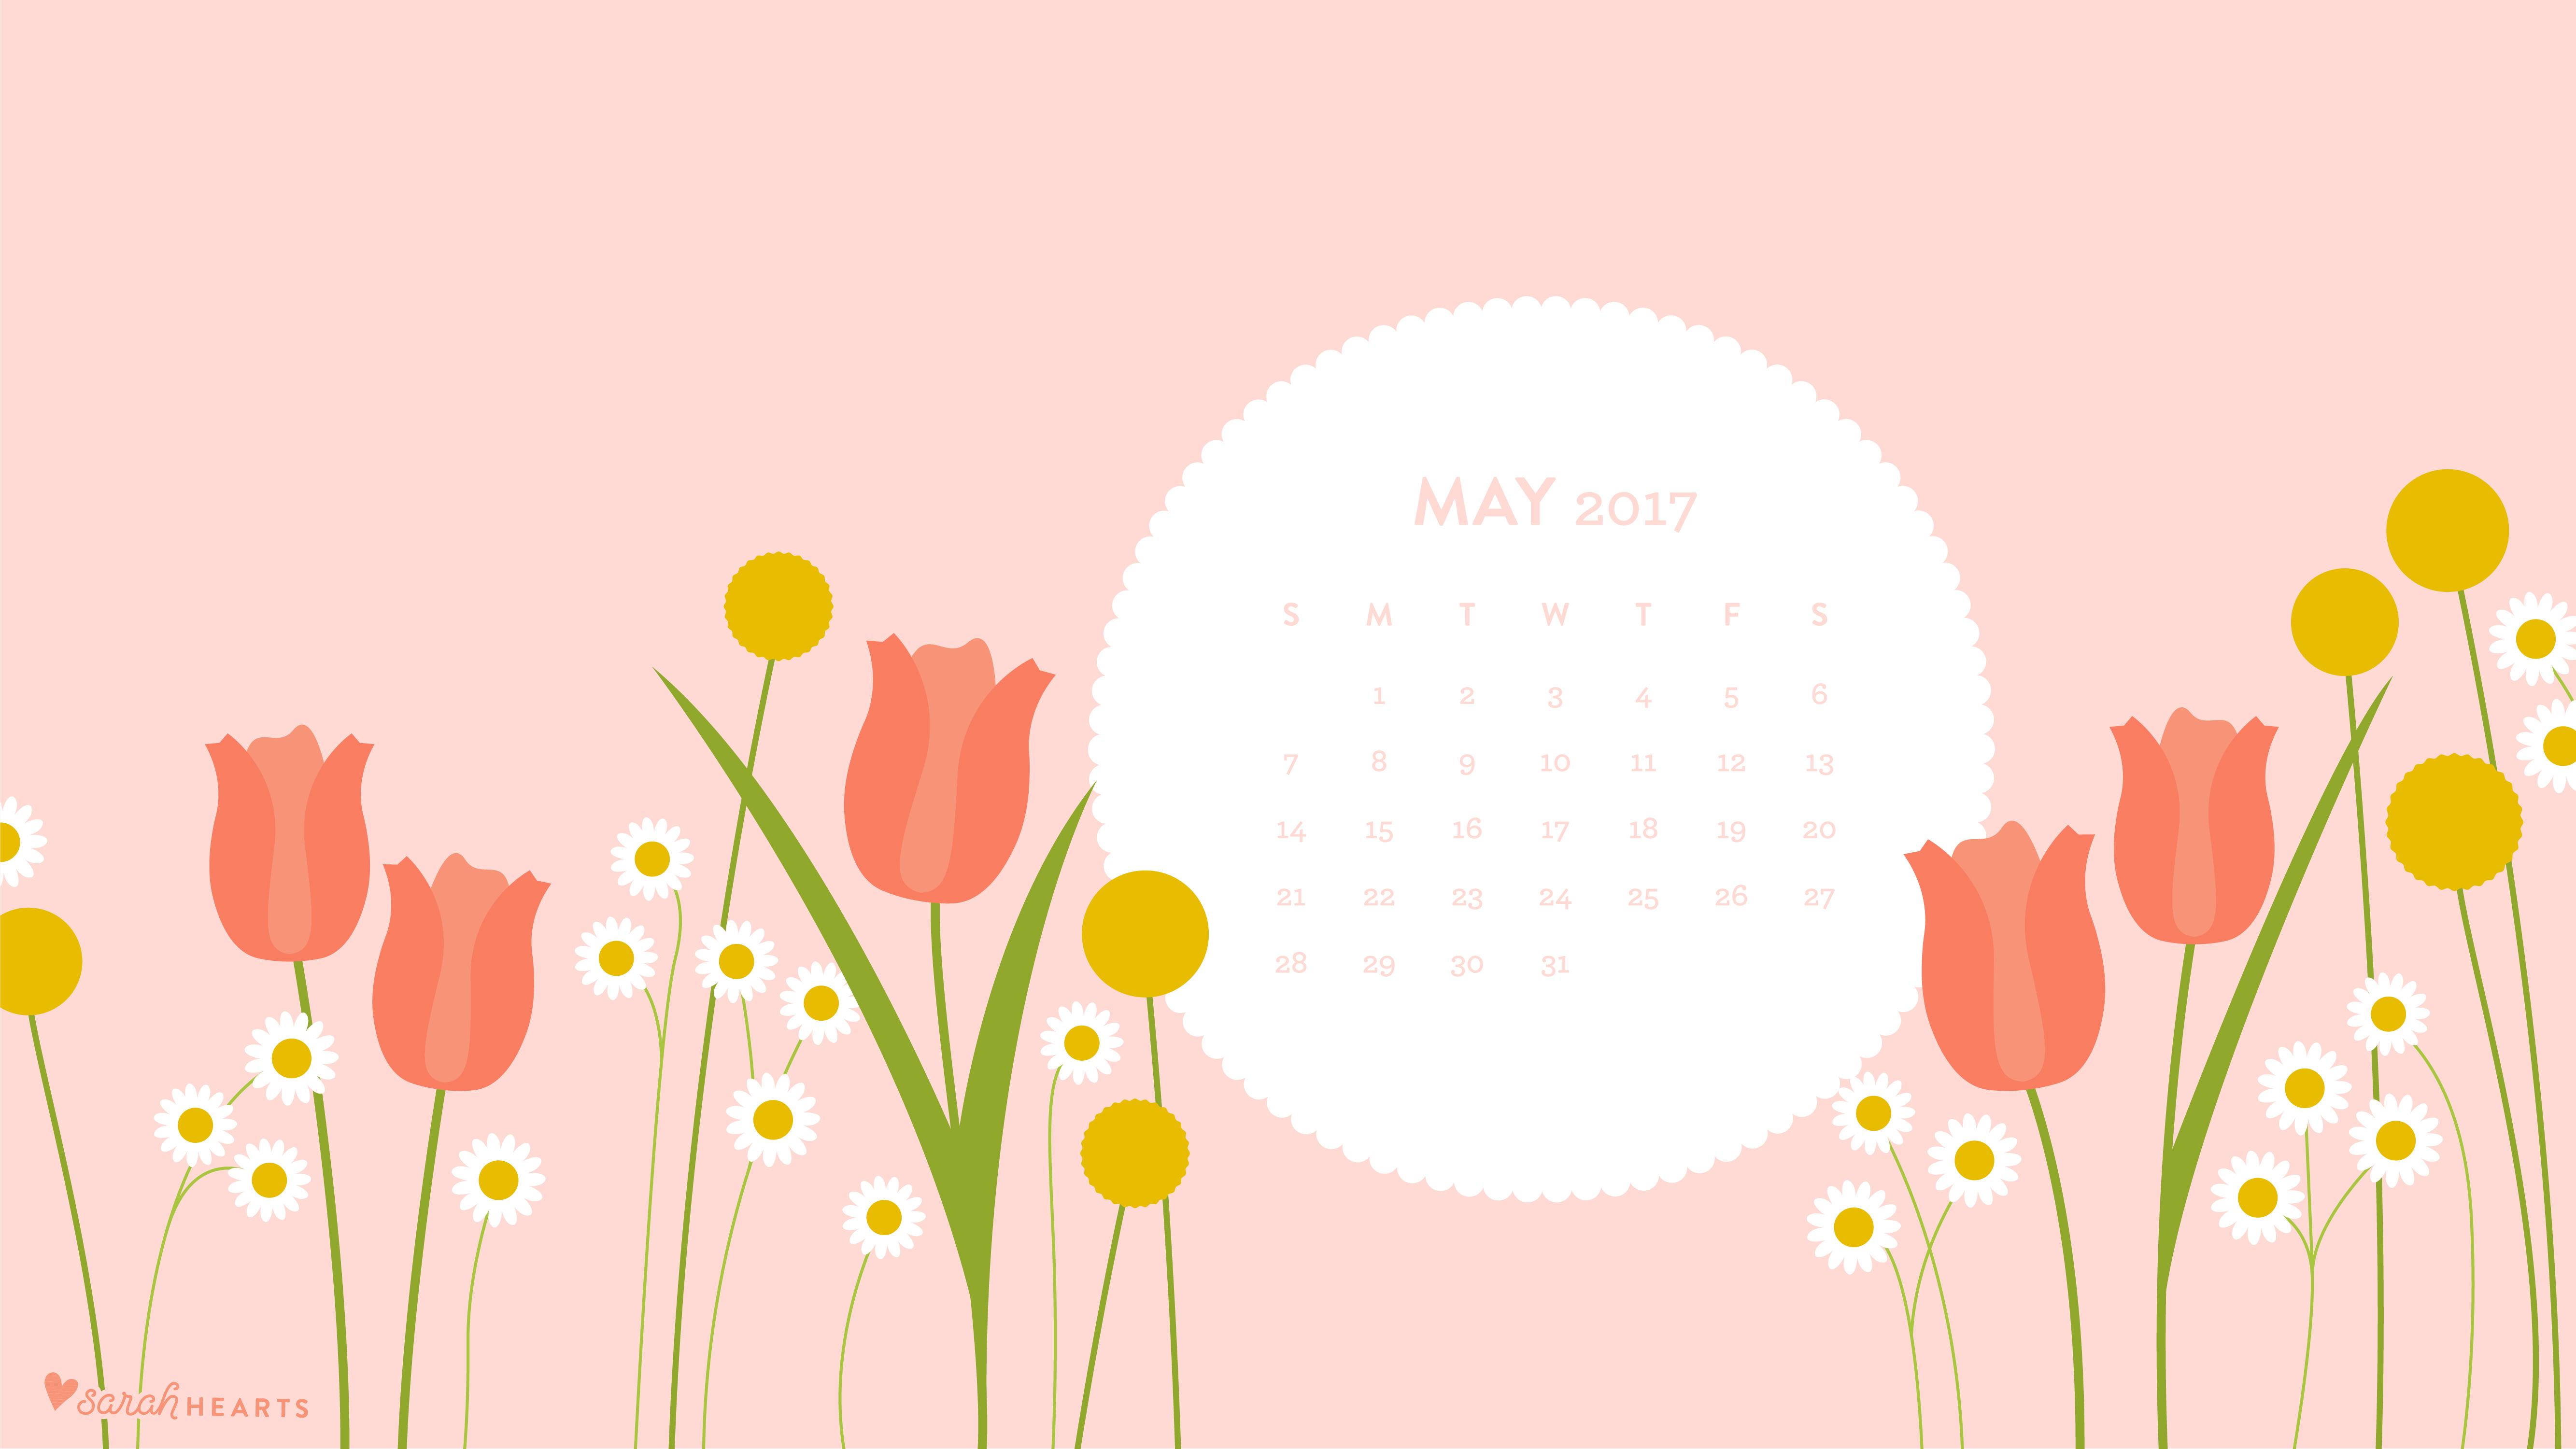 Cute Wallpaper For Home Screen May 2017 Calendar Wallpaper Sarah Hearts